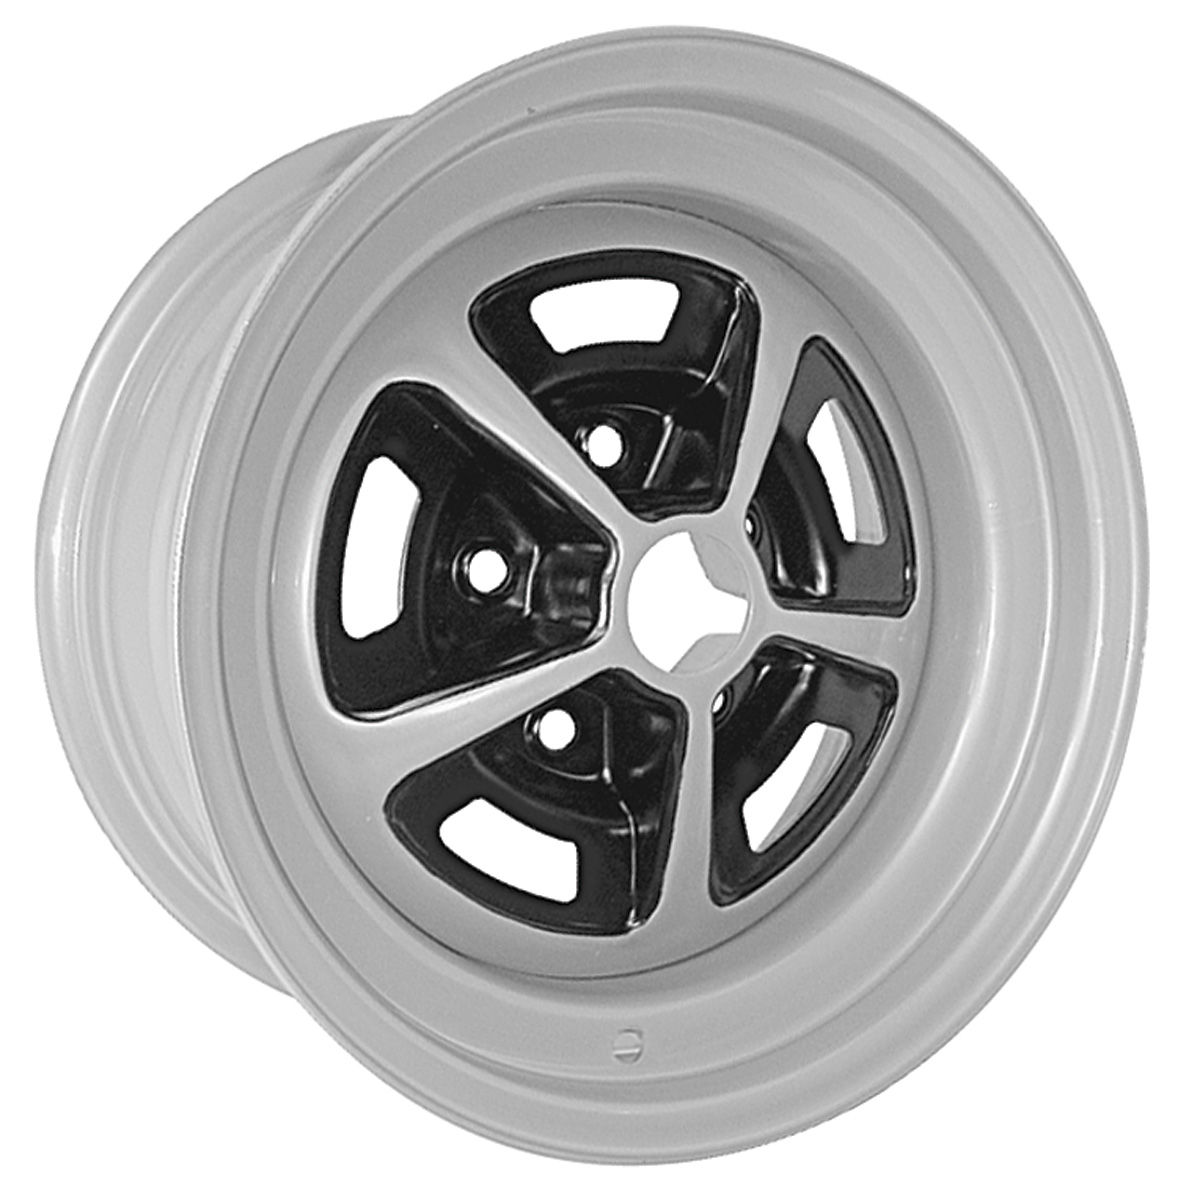 "Wheel, Super Sport, 15X7, 4-3/8"" Back Spacing"